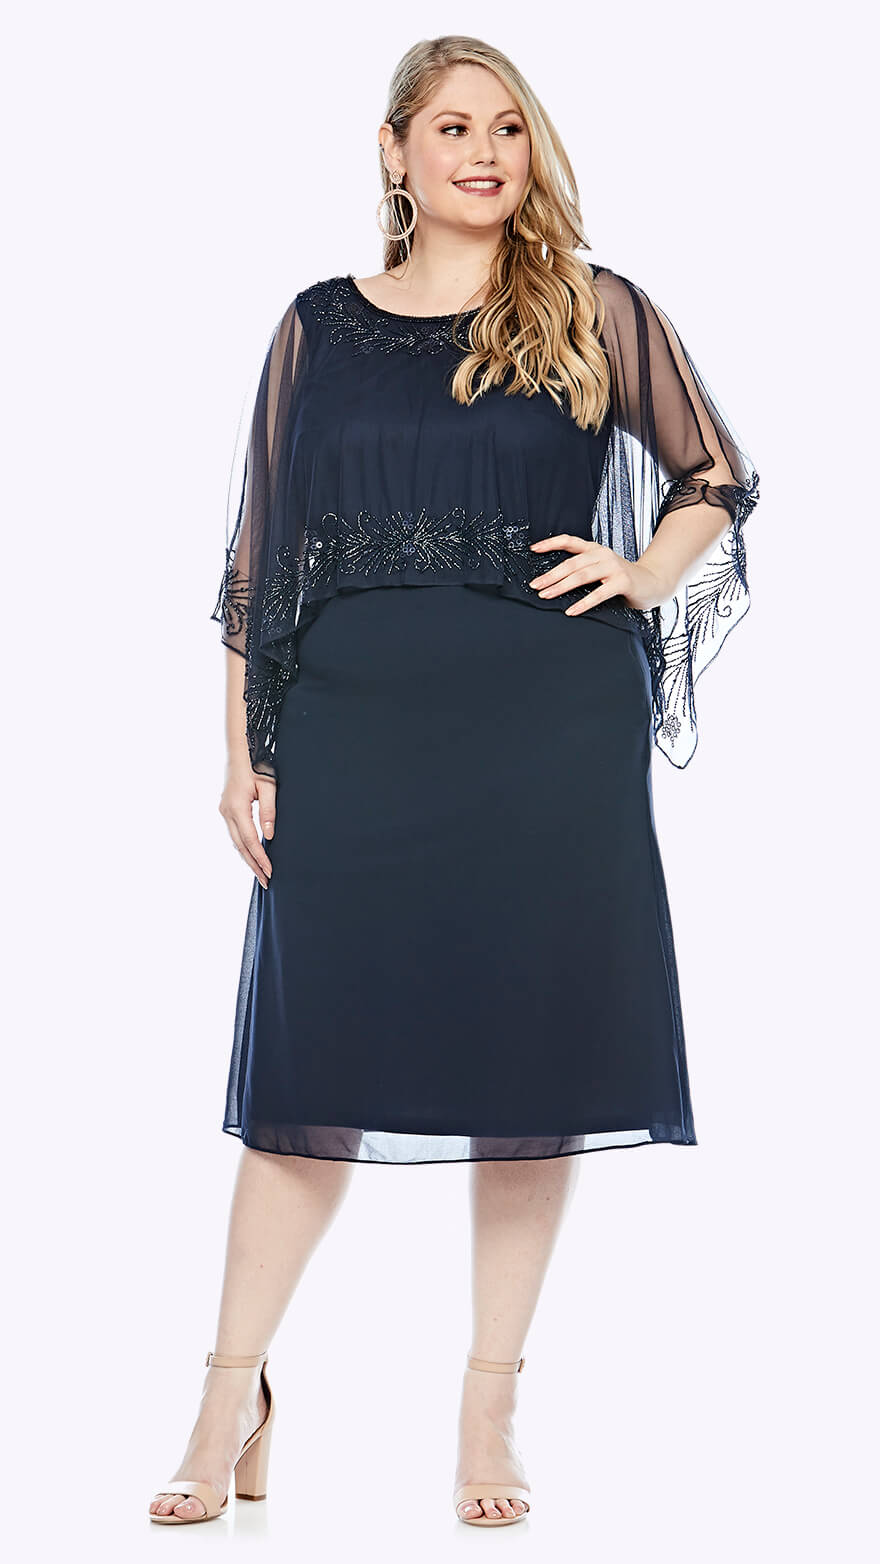 LJ0375 Mid-length dress with chiffon overlay and beaded trim